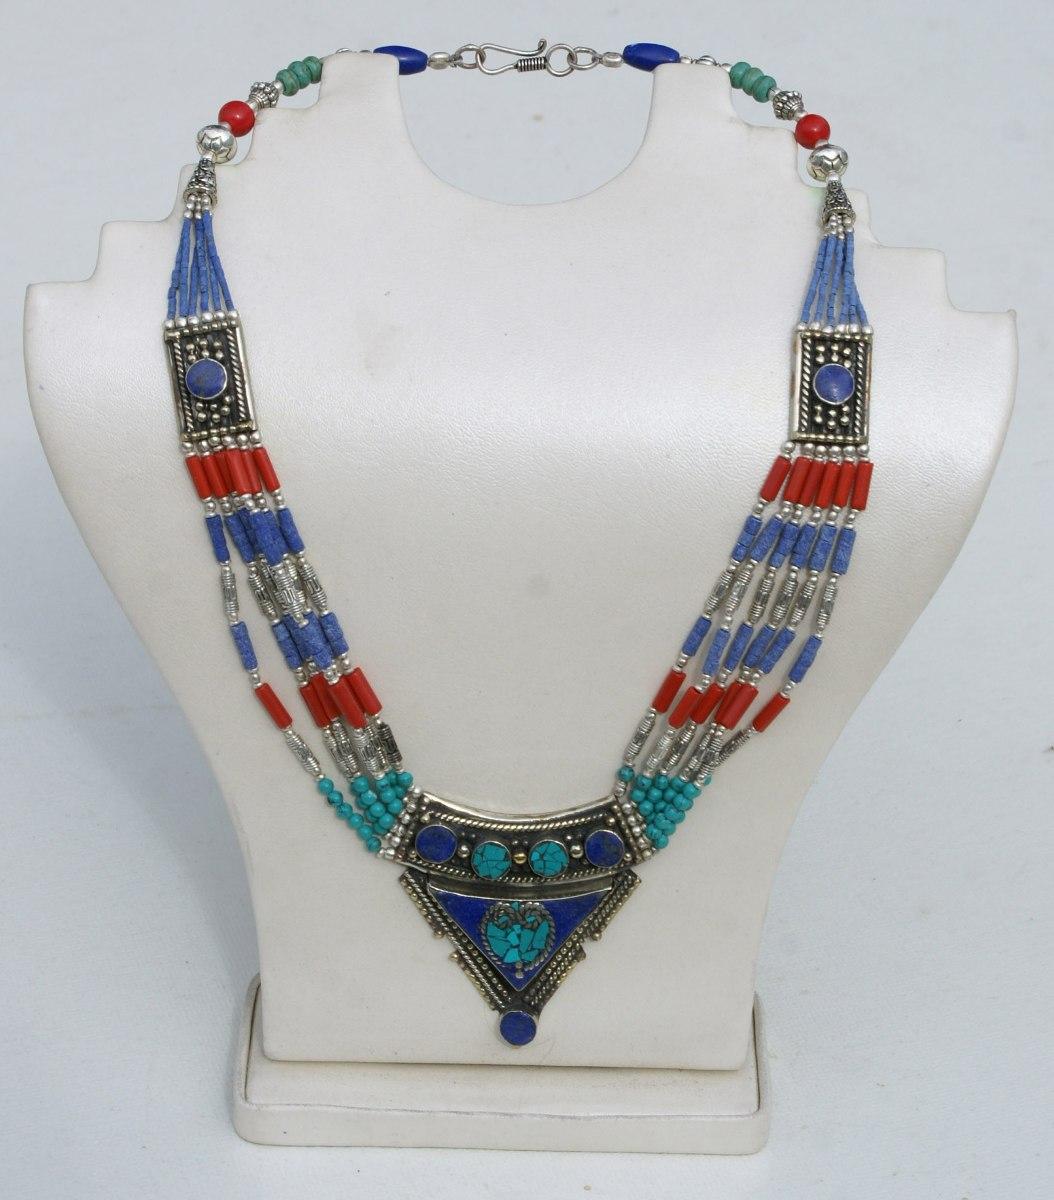 ed4f3da7eee8 collar etnico de nepal moda etnica online bisuteria moderna. Cargando zoom.